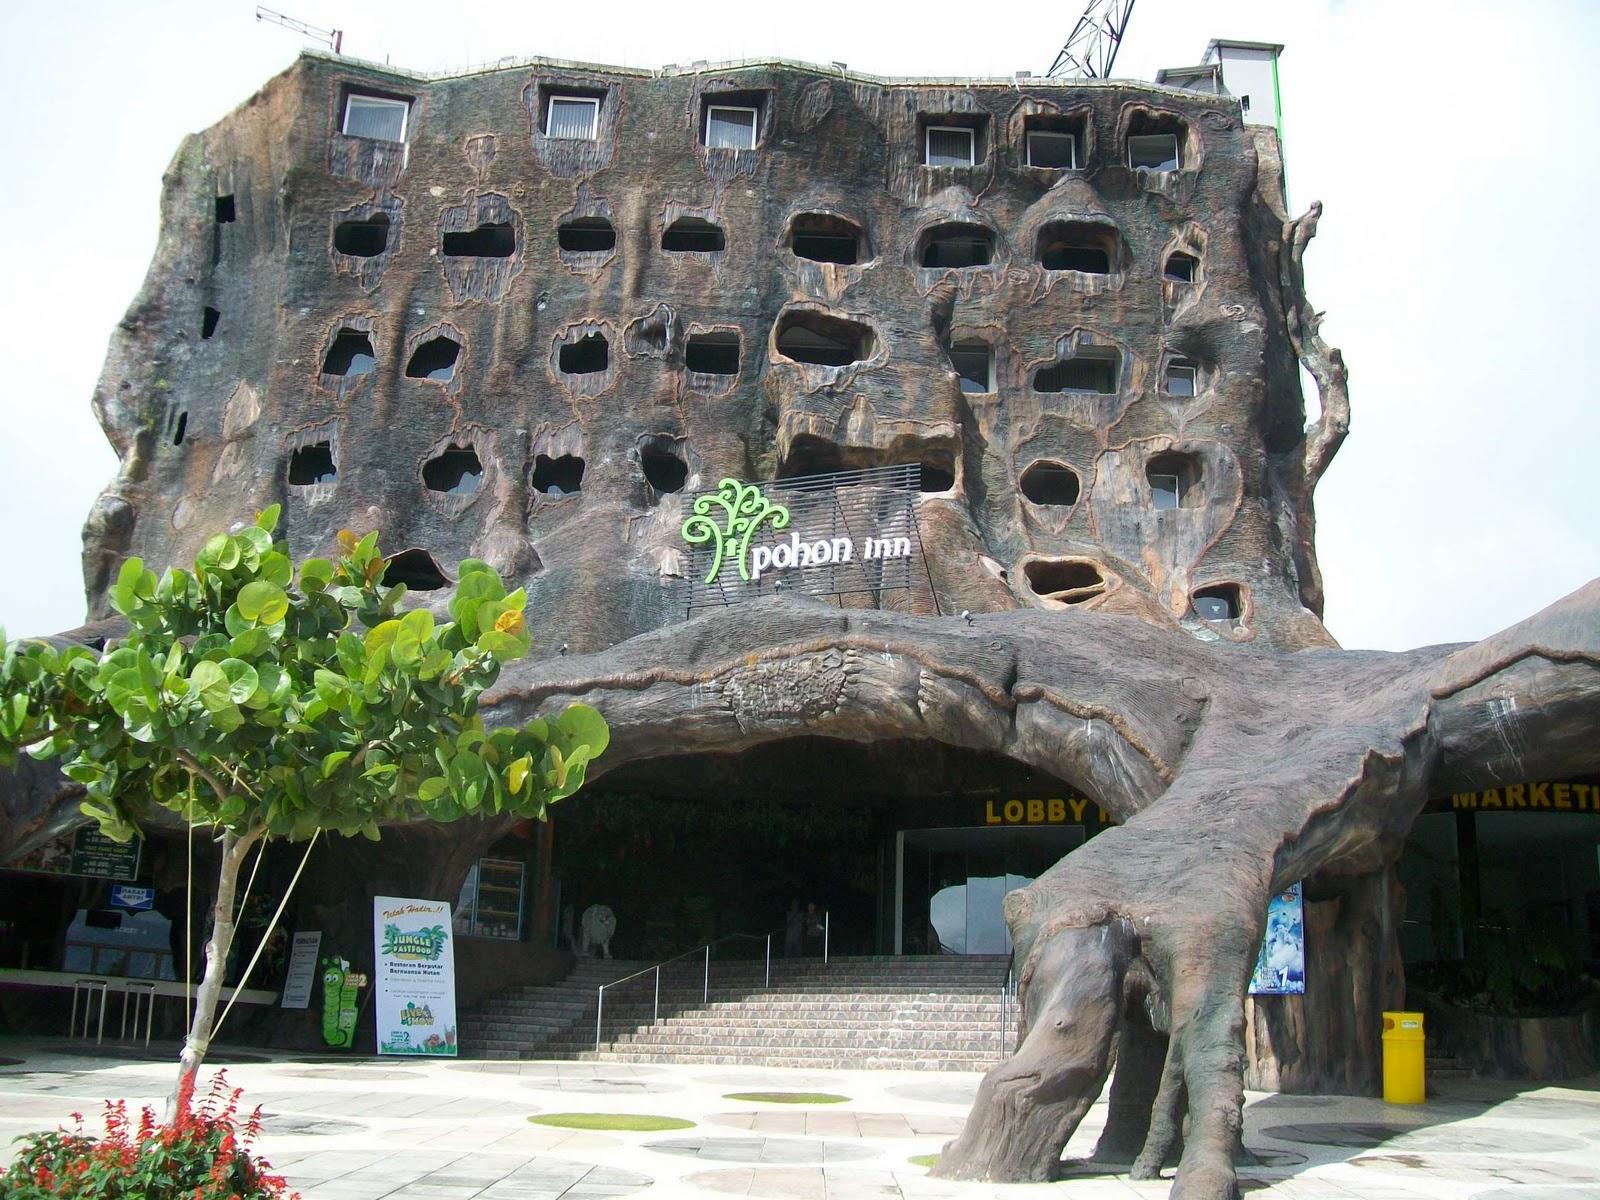 Tigerlily S Book East Java Surabaya Madura Malang Trip Part 2 Batu Secret Zoo Agrowisata Pohon Inn Hotel Review